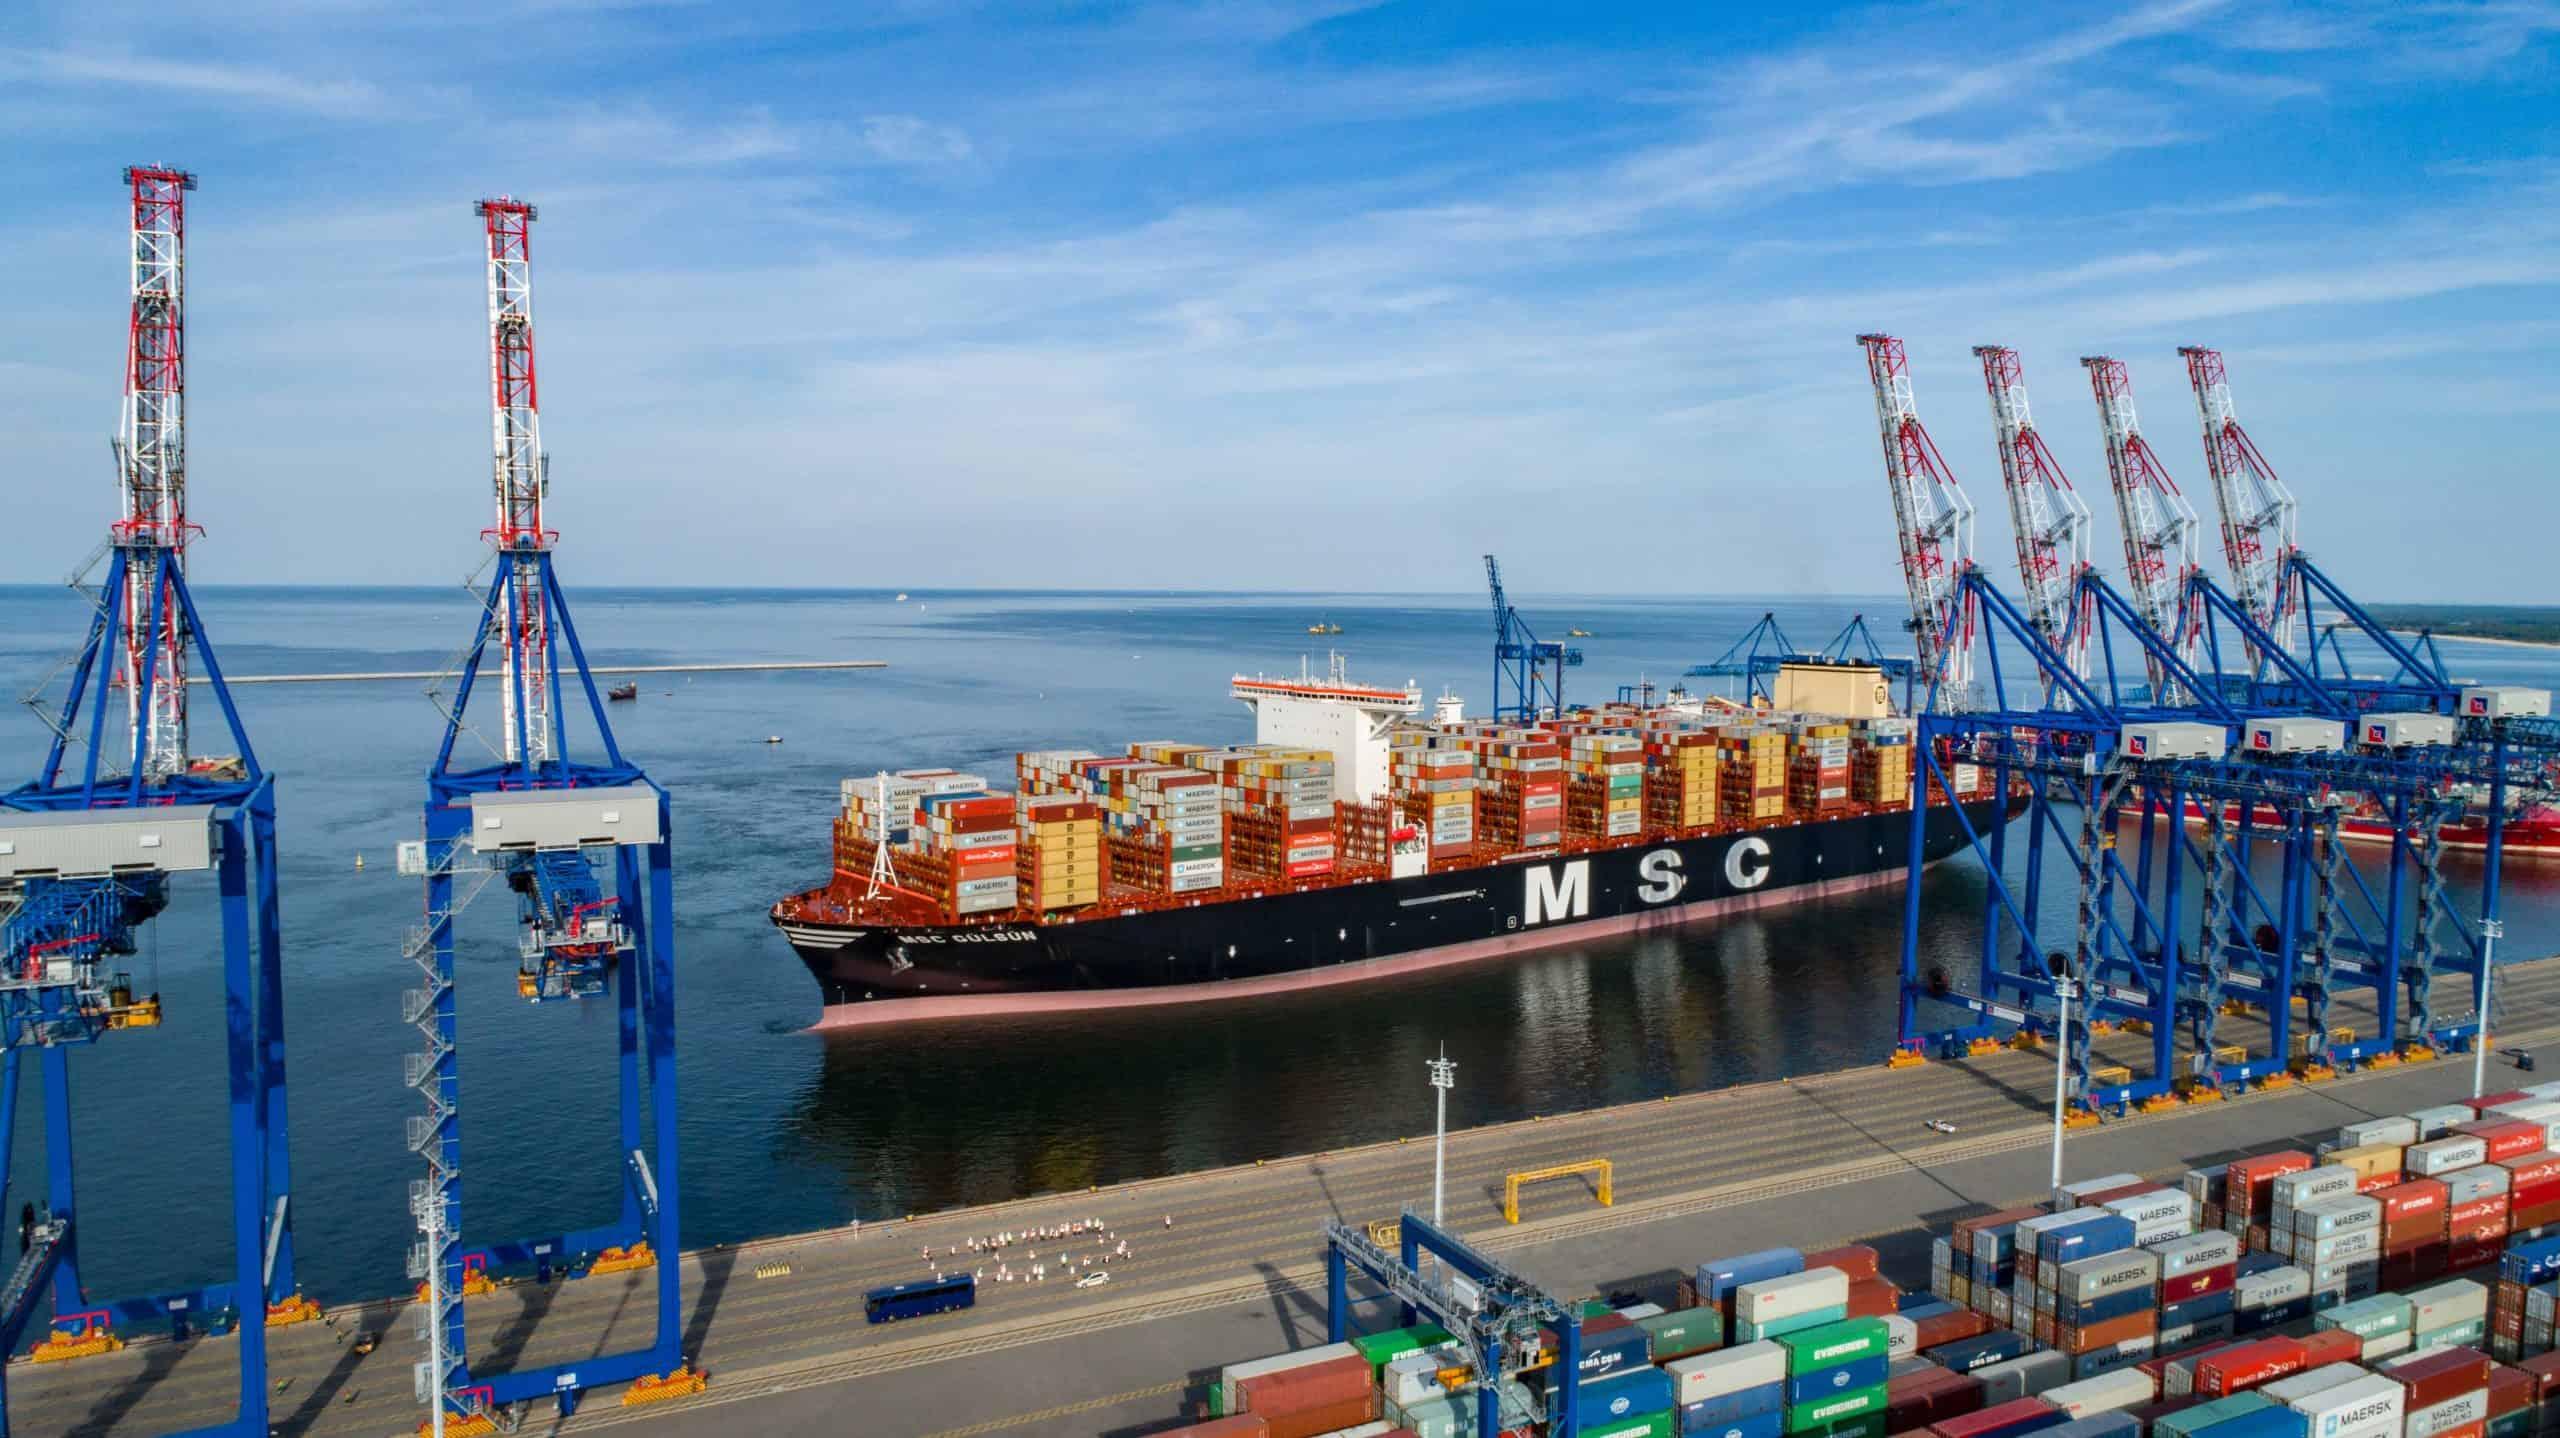 Nigerian Ports Authority Recruitment 2021/2022 Application Form Portal